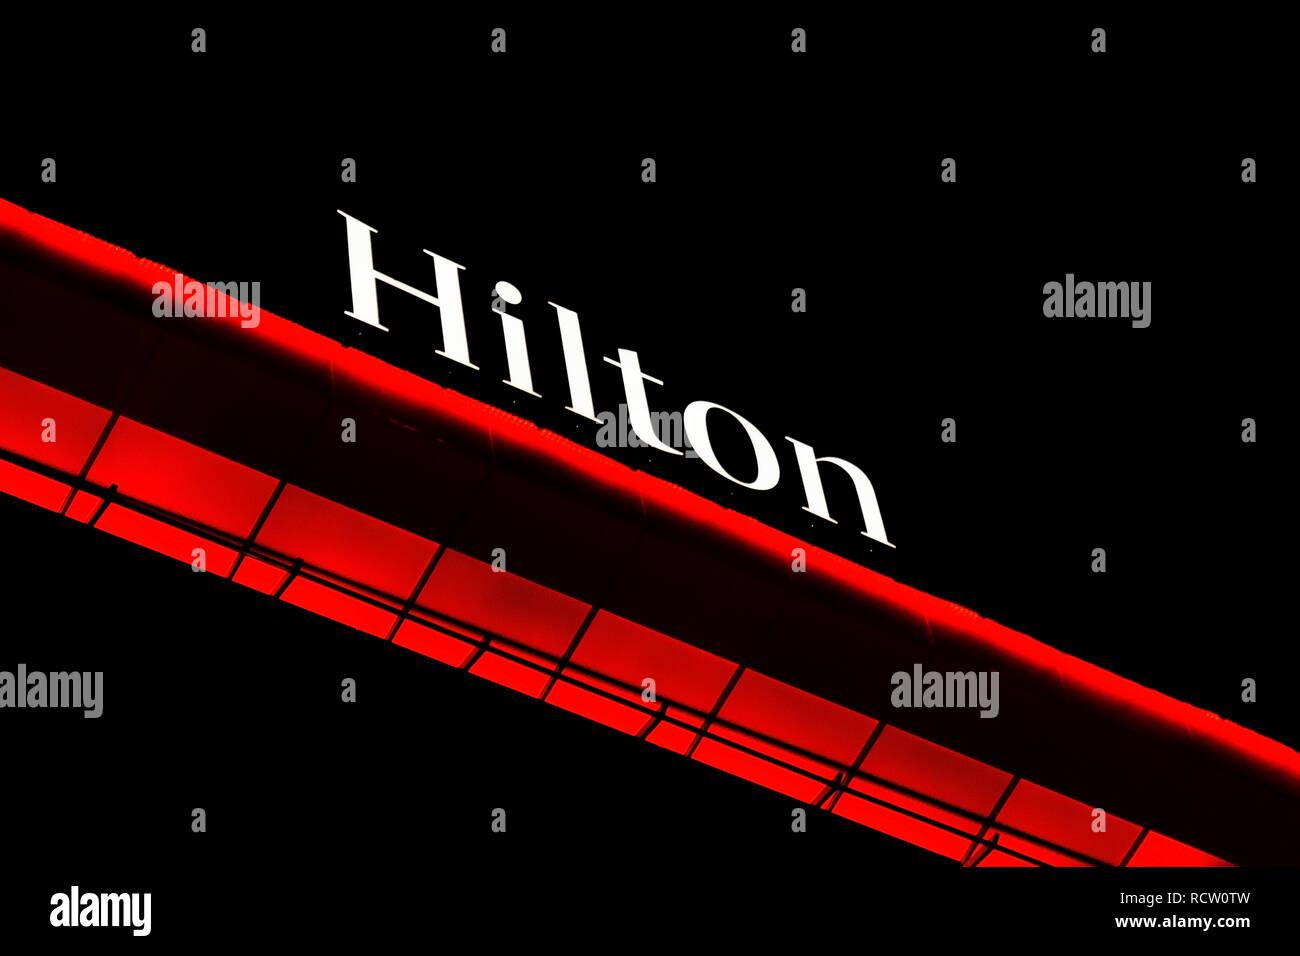 BELGRADE, SERBIA - MARCH 10, 2018 Hilton hotel logo on top of building at night in Belgrade, Serbia - Stock Image